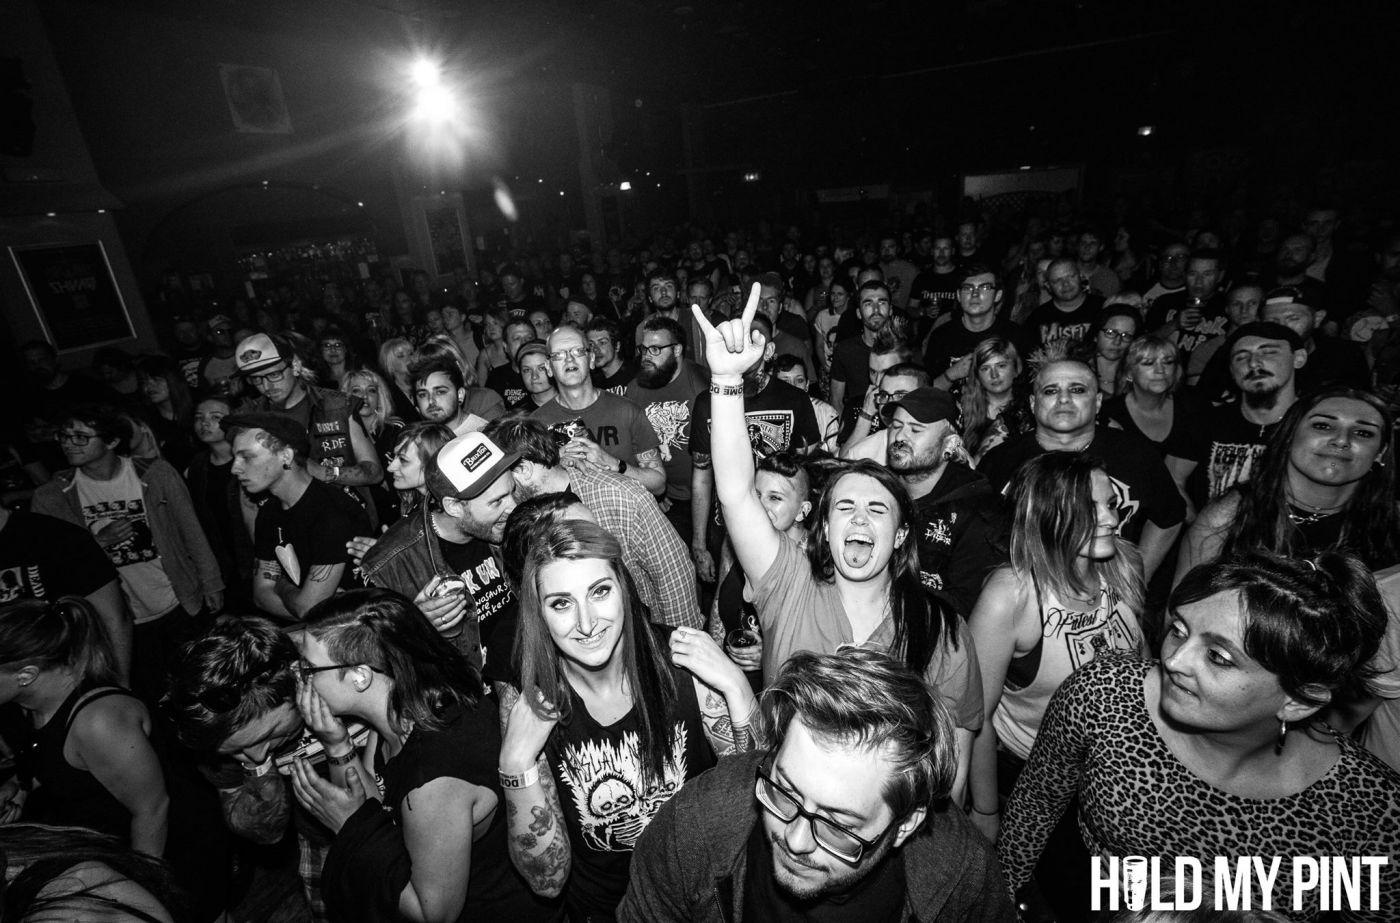 wonkfest crowd 1